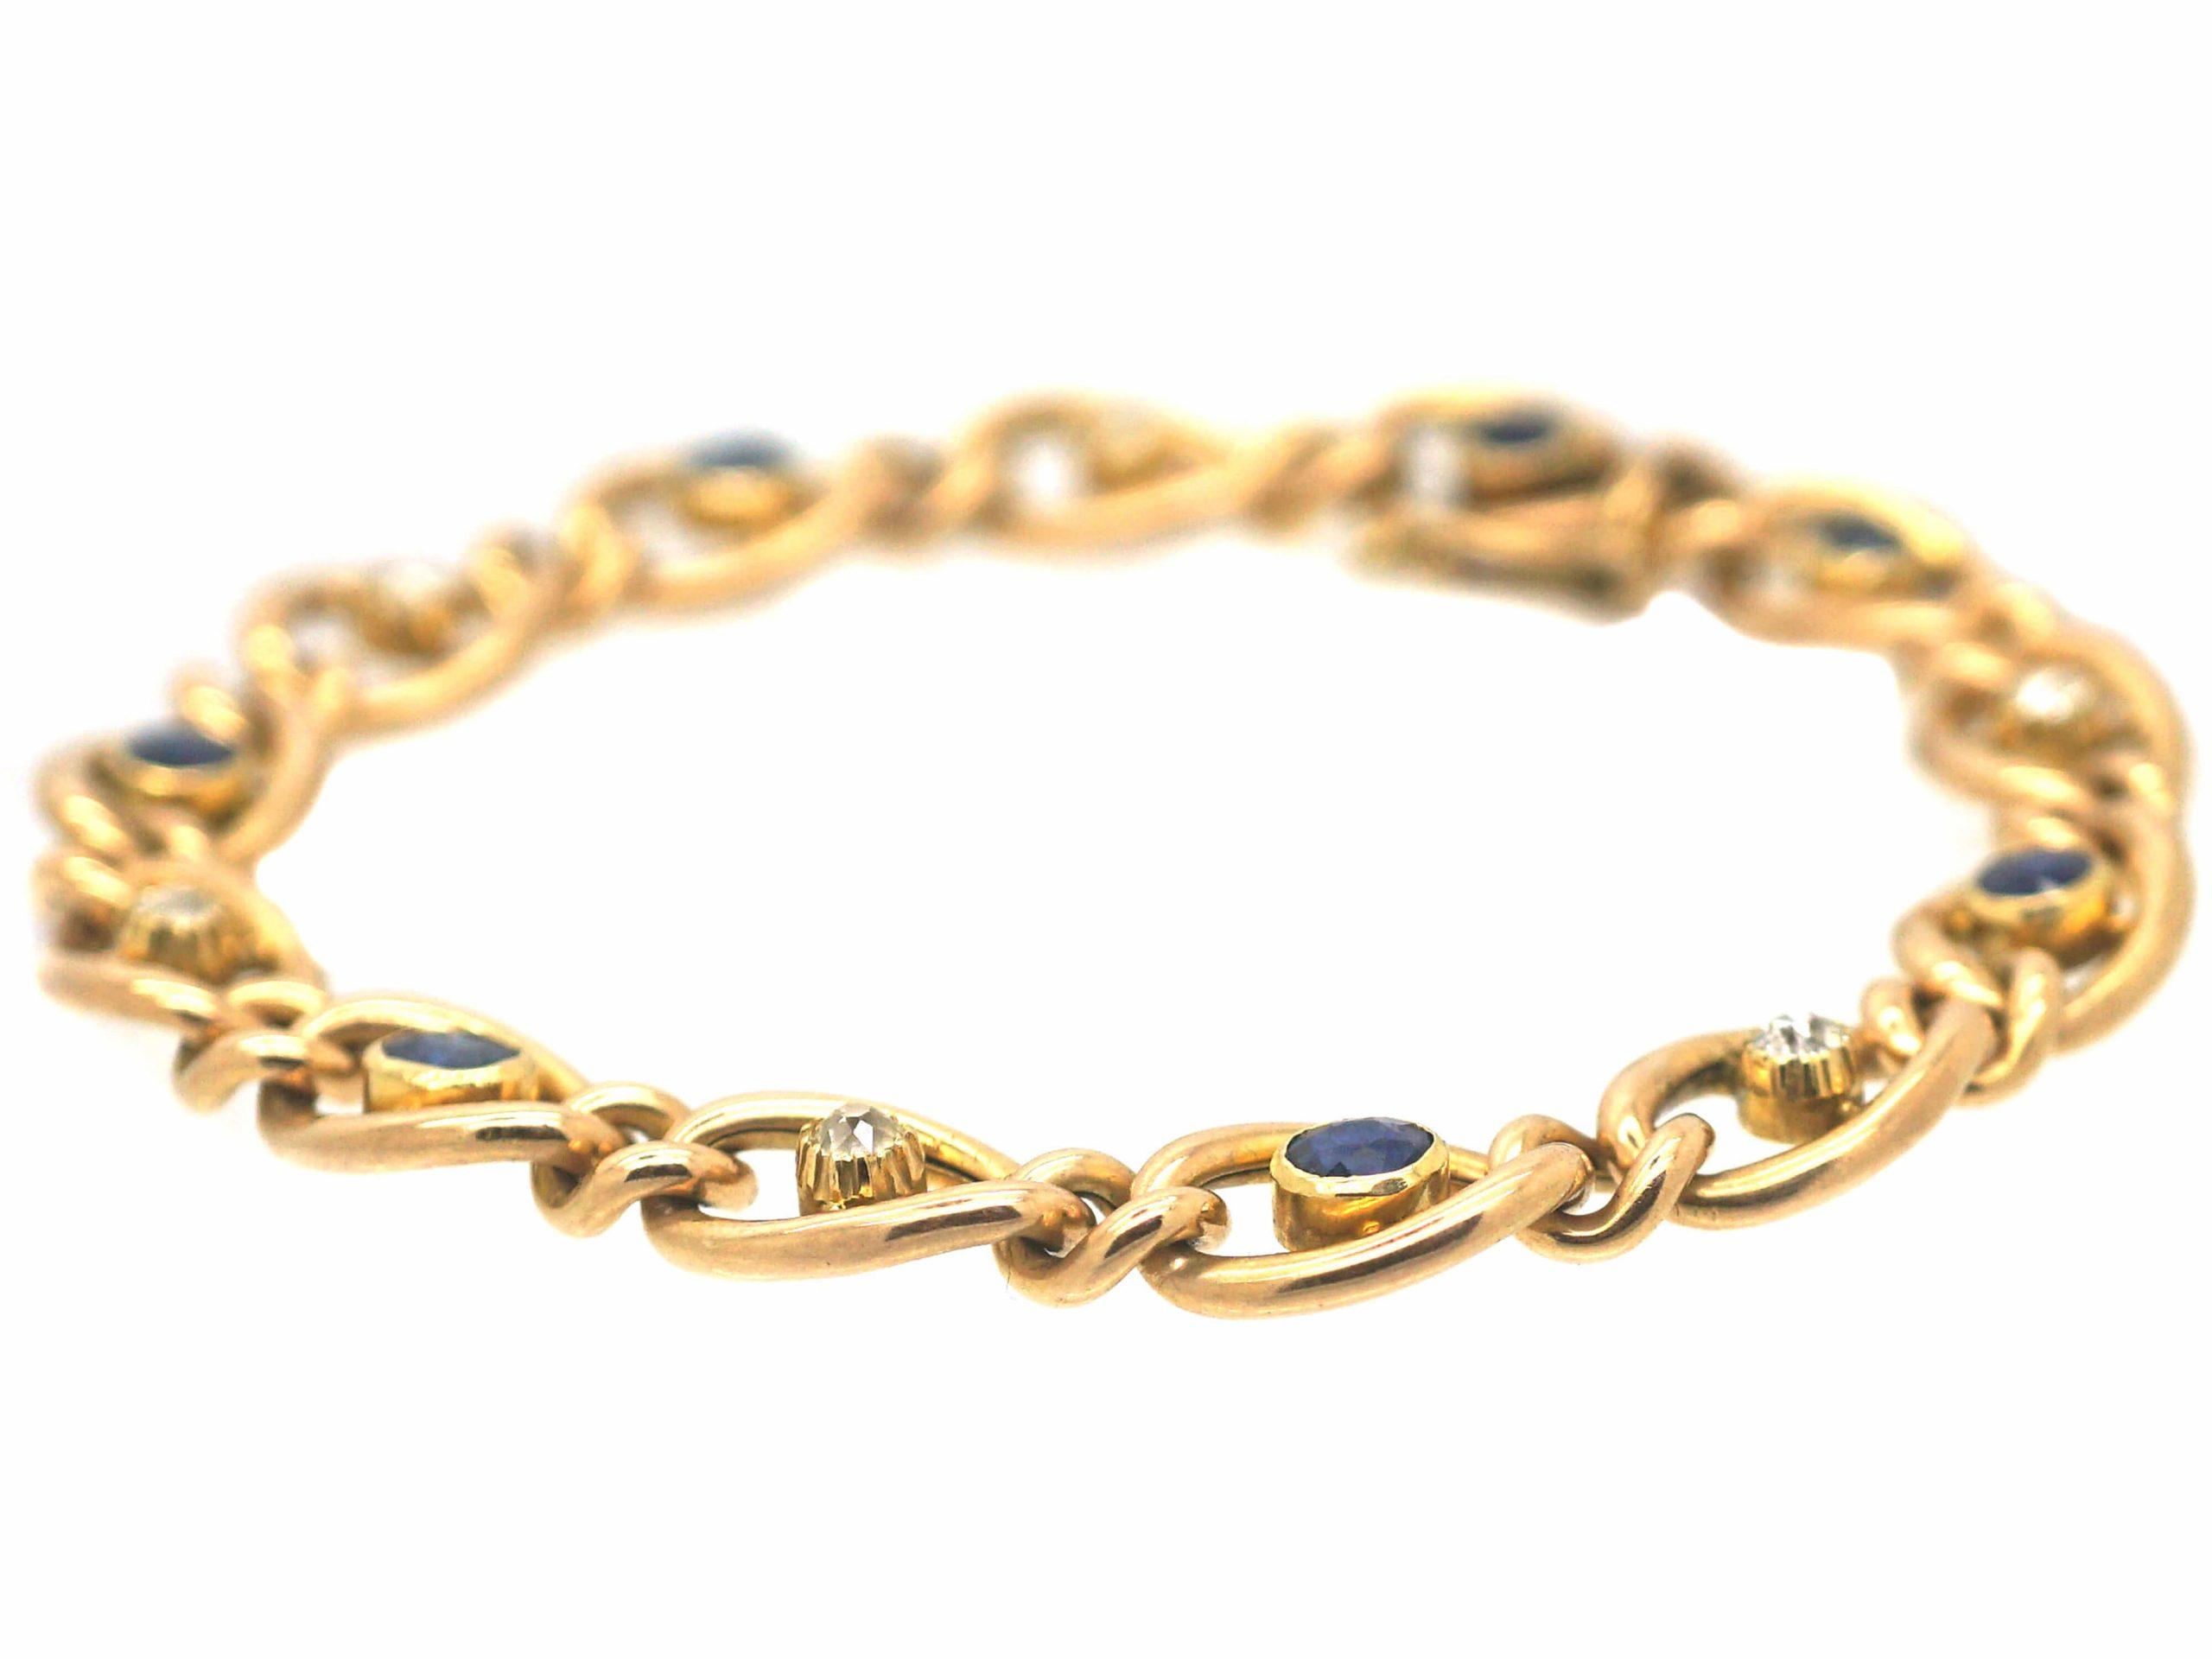 Edwardian 15ct Gold, Sapphire & Diamond Curb Link Bracelet